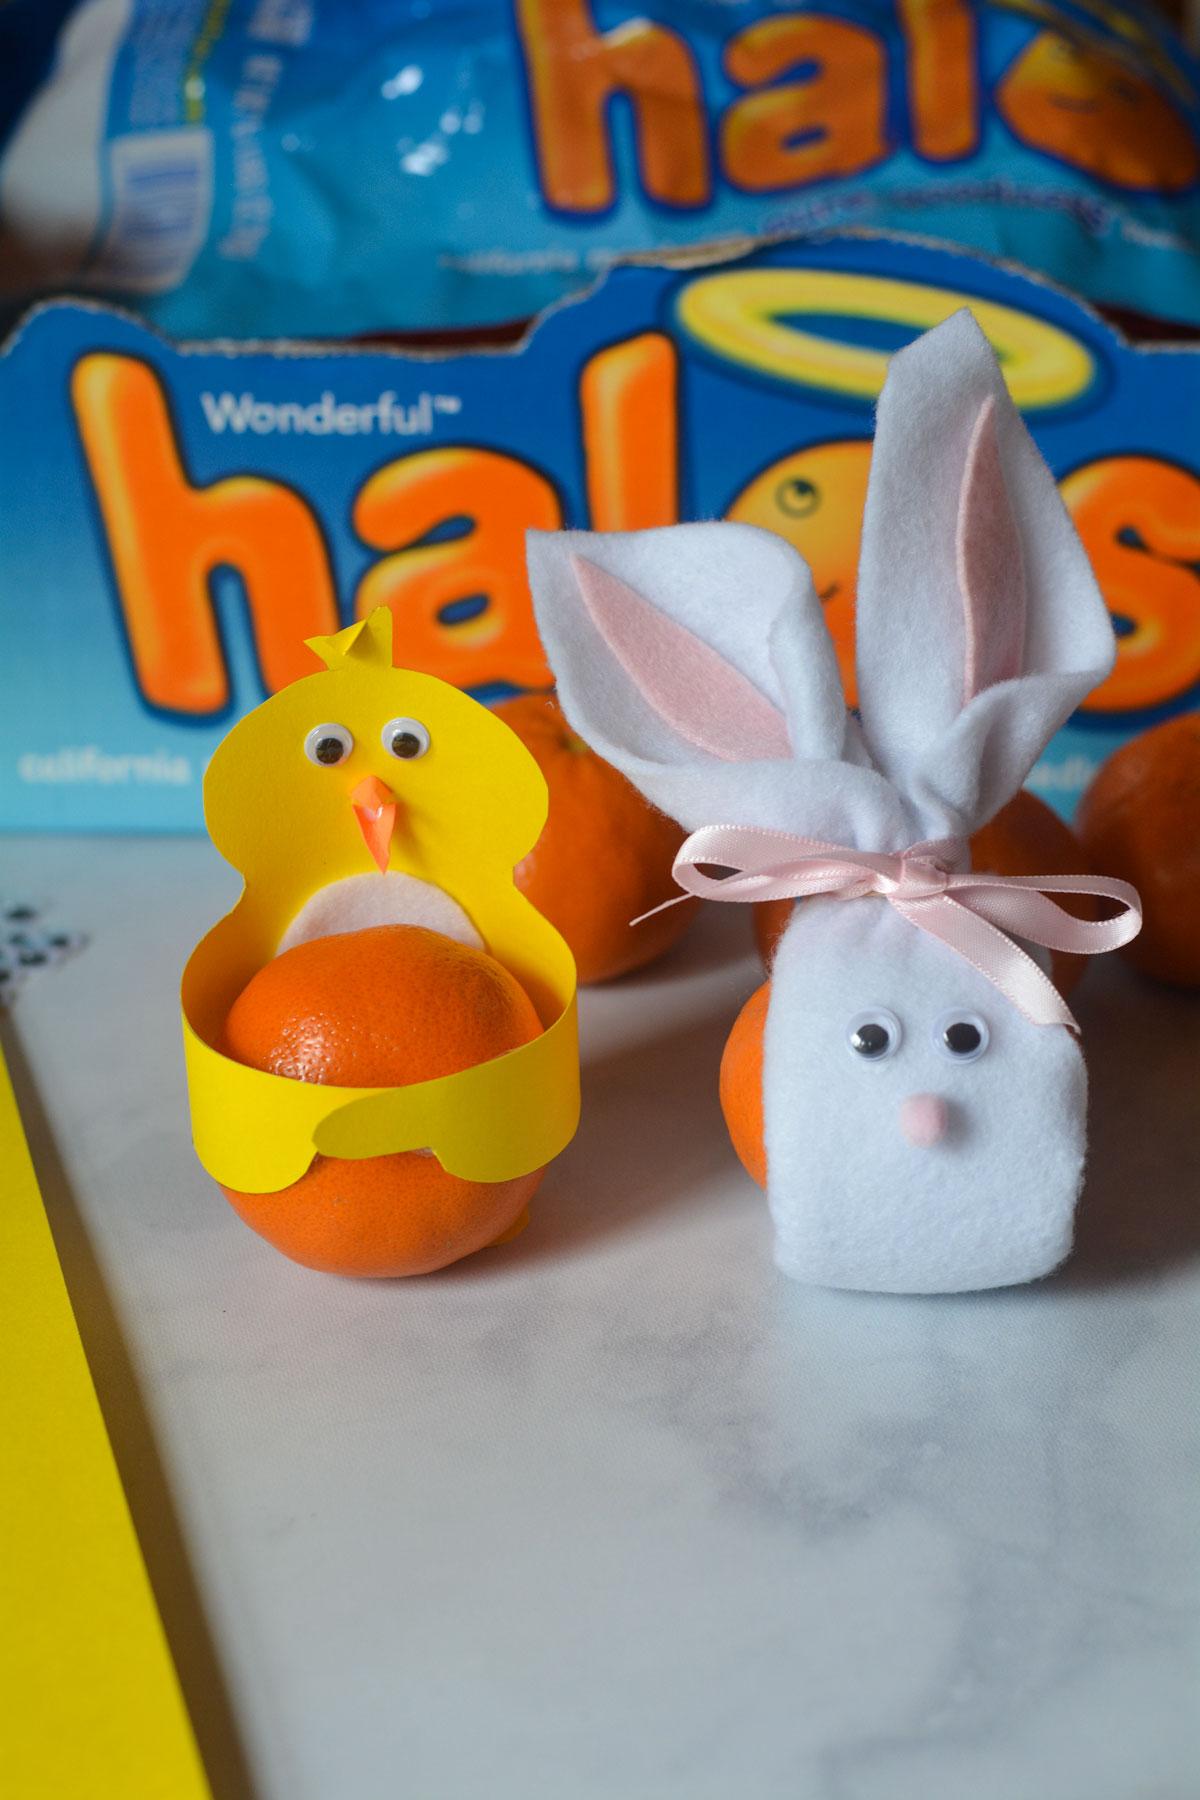 Halos Mandarins Easter Crafts